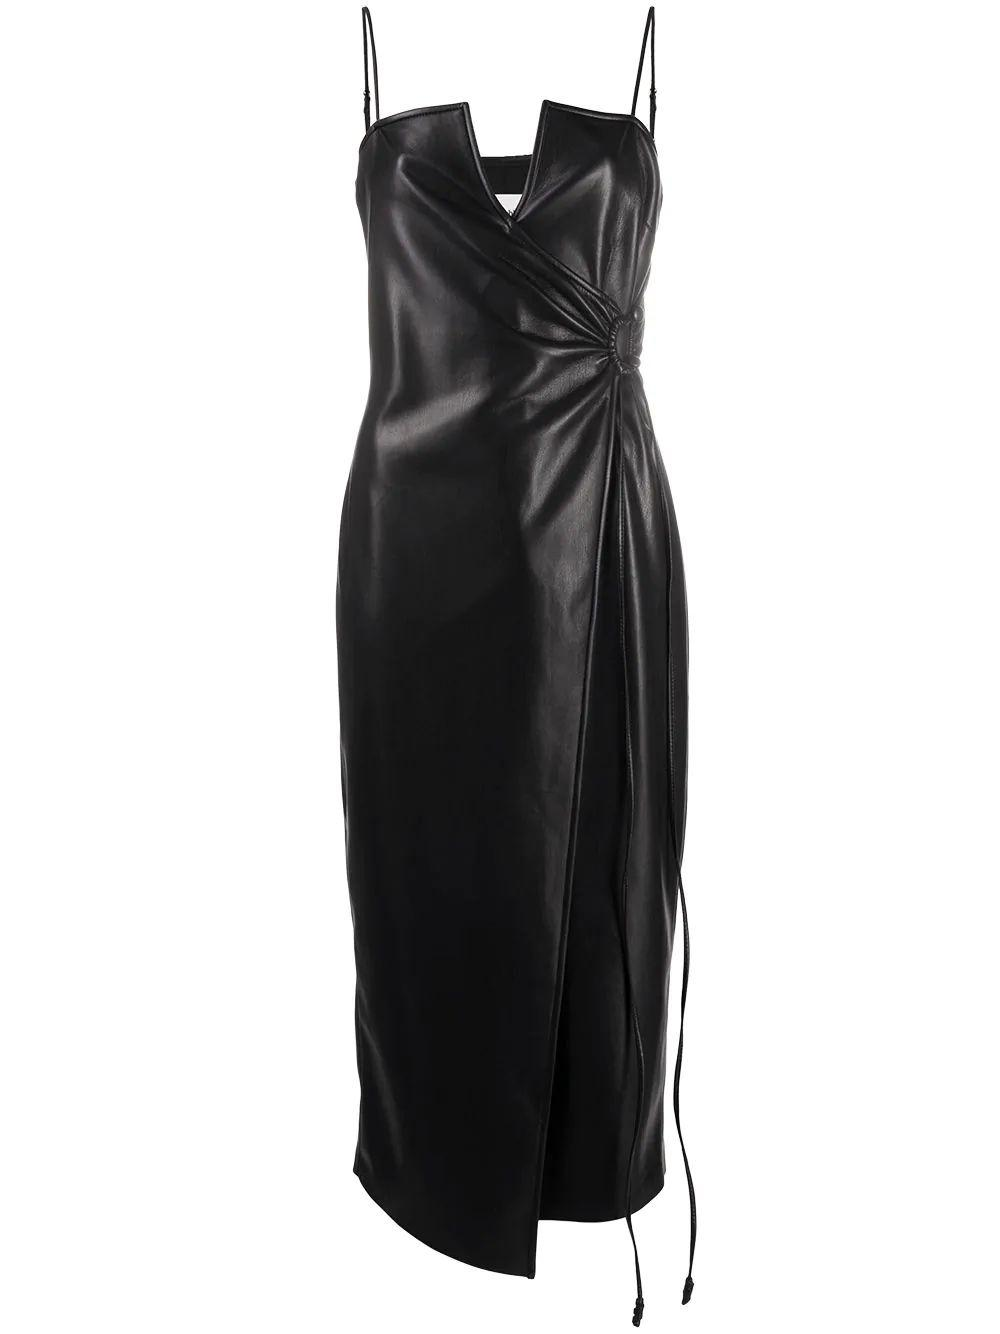 Anubi Faux Leather Wrap Dress